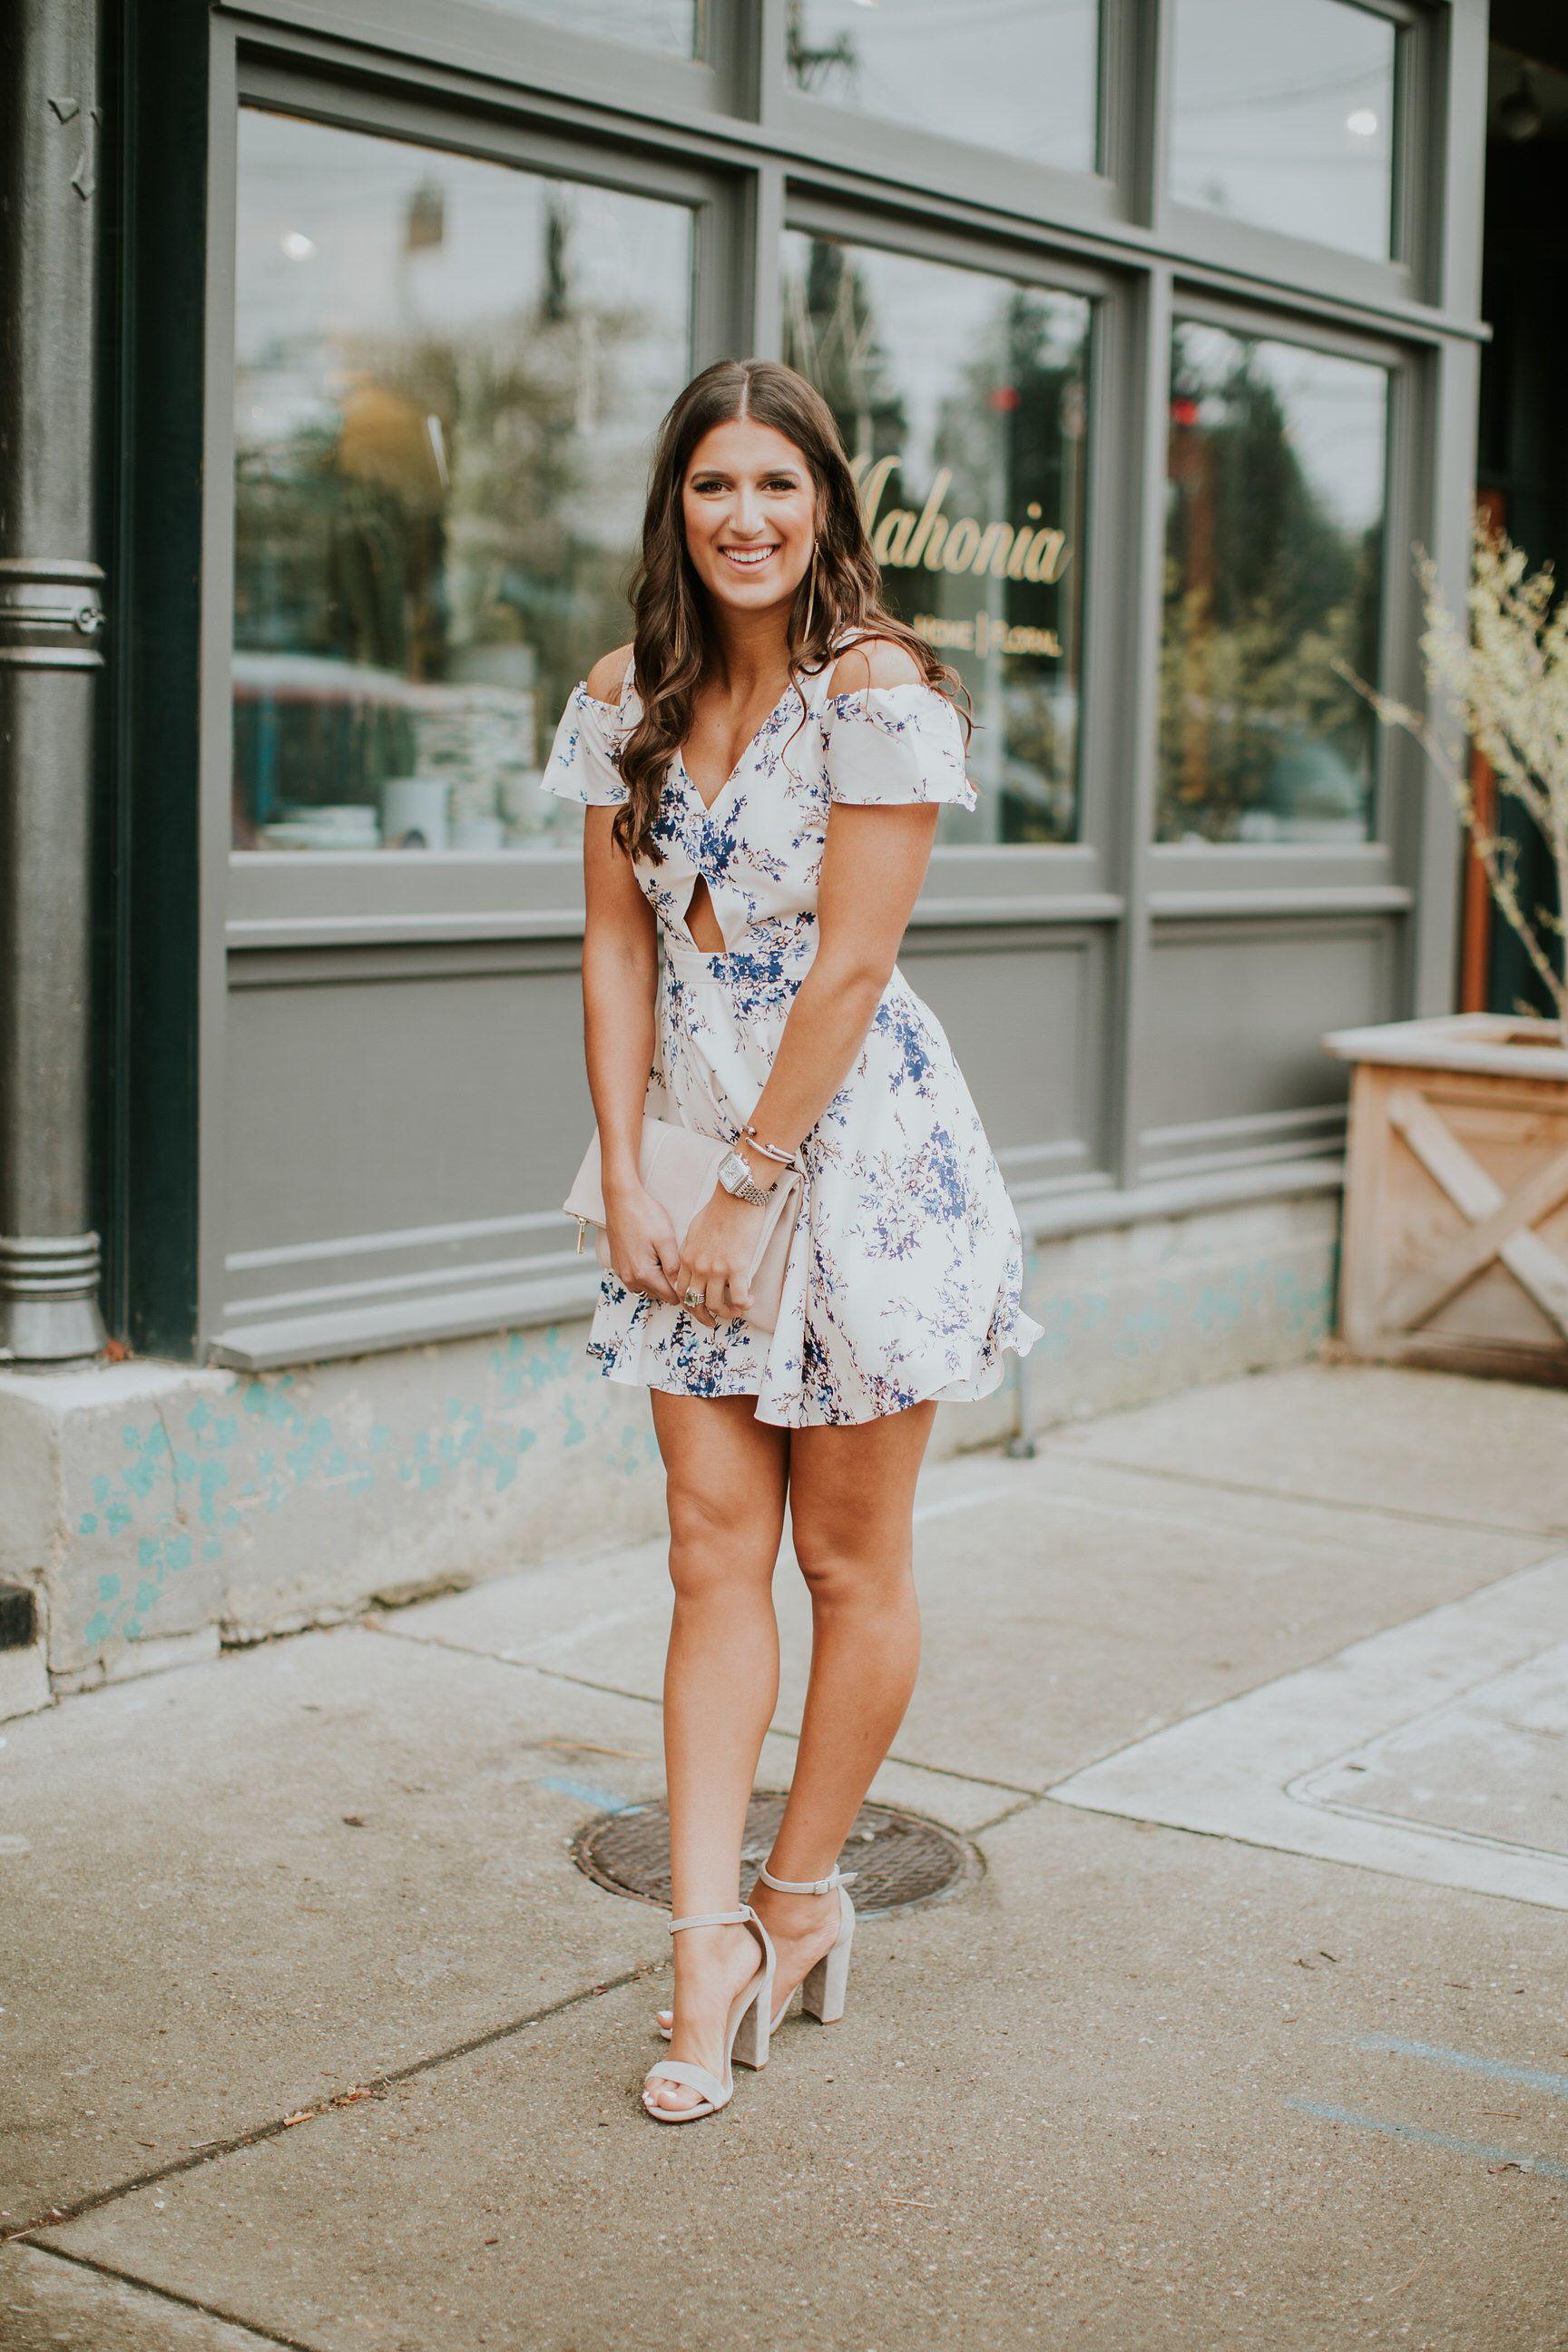 Floral Cold Shoulder Dress A Southern Drawl Wedding Guest Heels Dresses Kentucky Derby Dress [ 2592 x 1728 Pixel ]